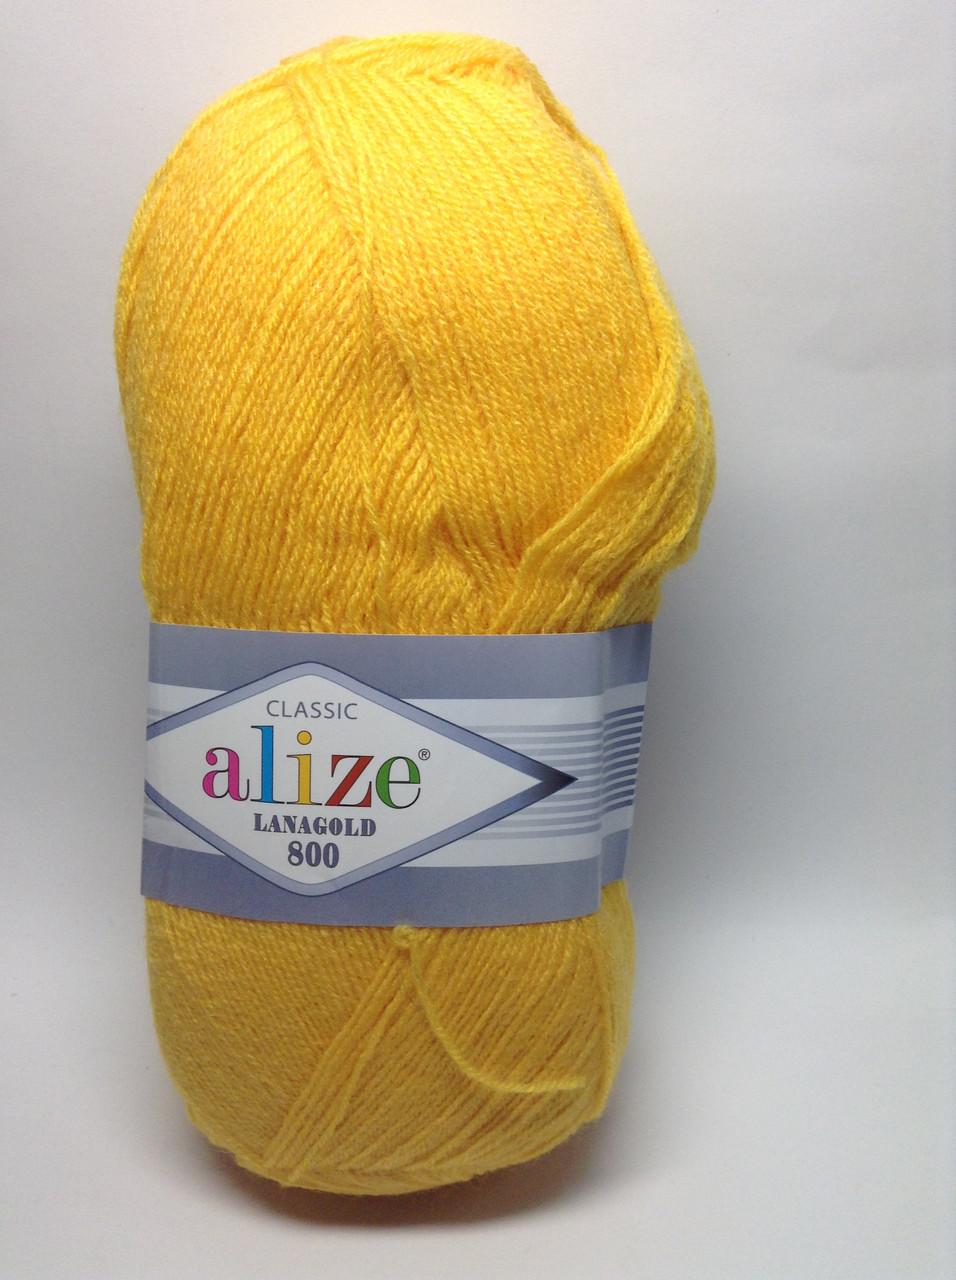 Пряжа lana gold 800 - цвет желтый